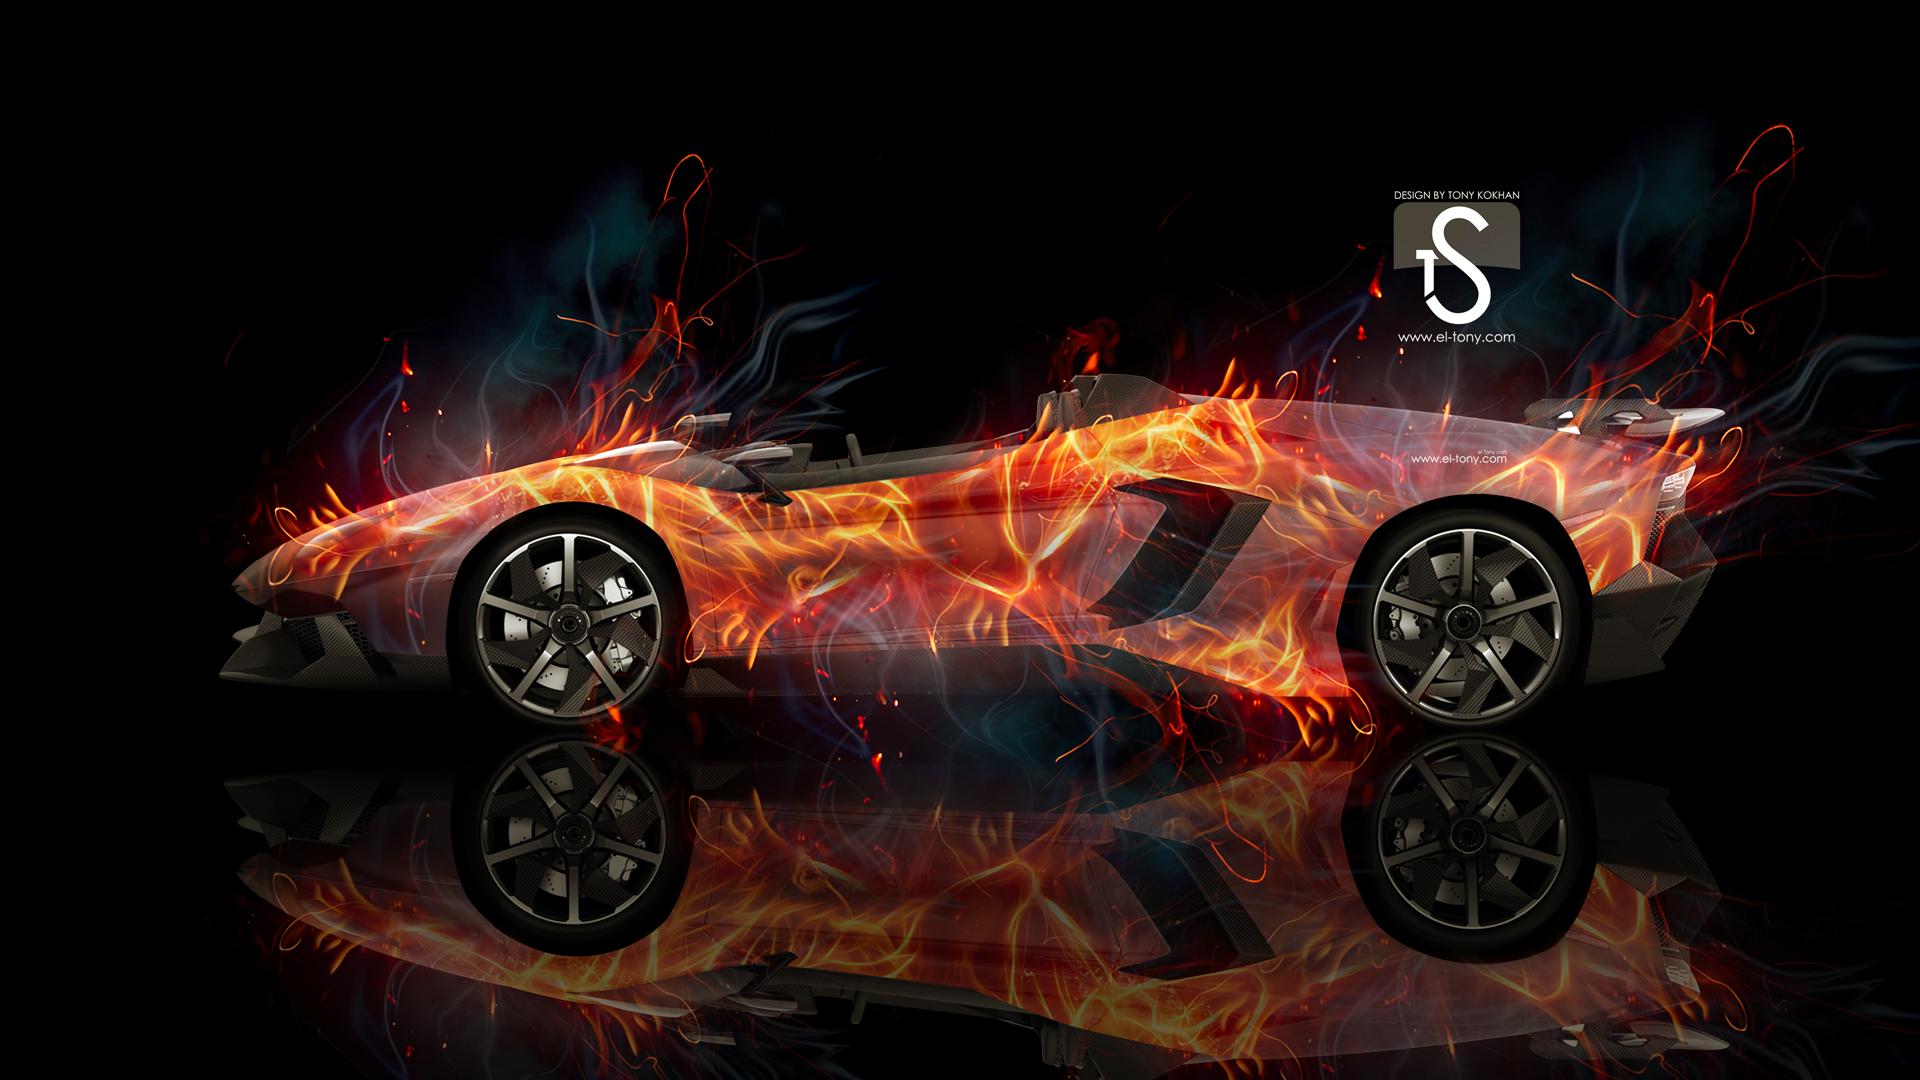 Download Lamborghini Aventador J Fire Photoshop Car 1920x1080 Wwwel